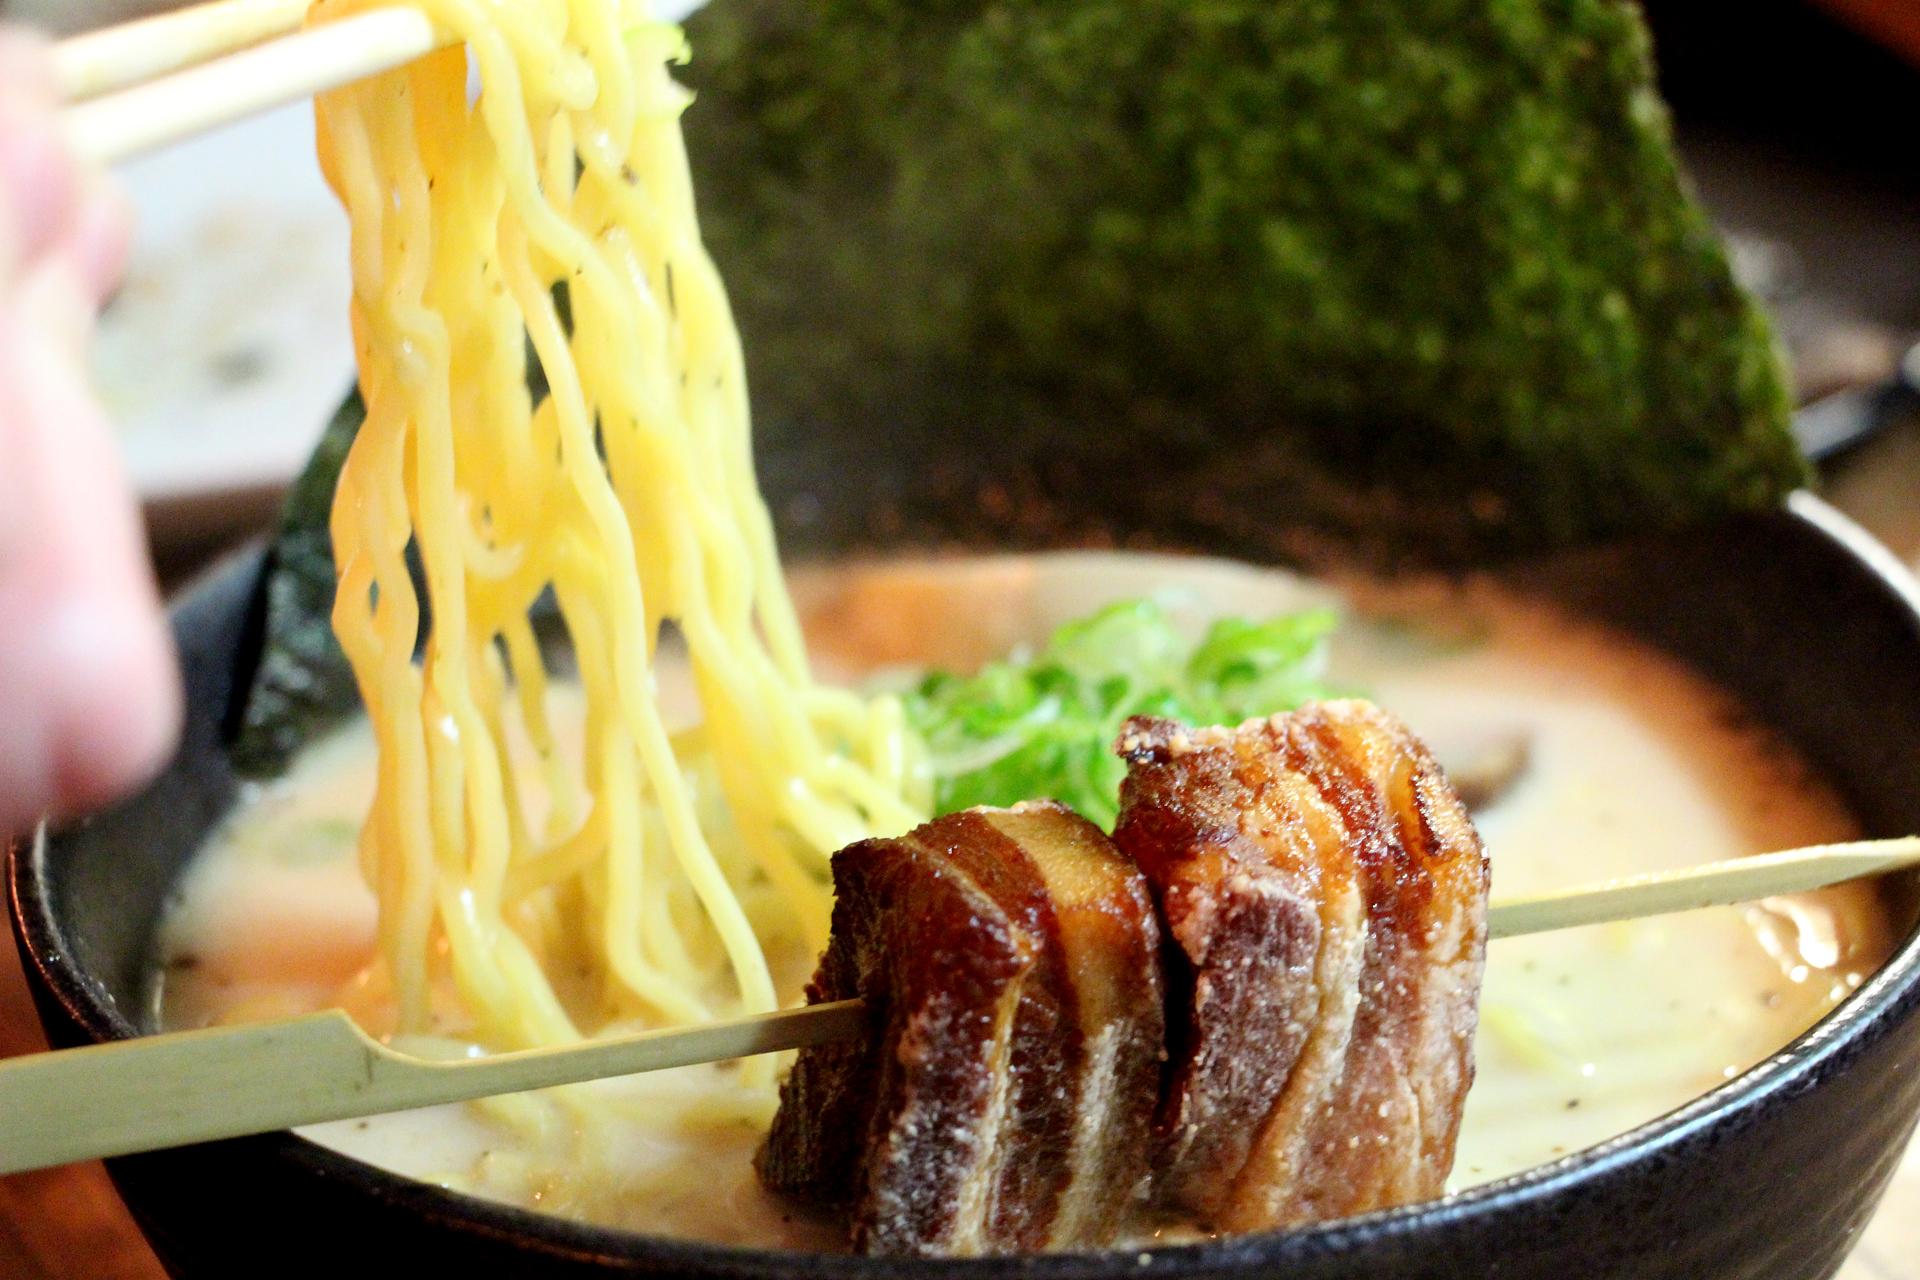 Izakaya Sozai's ramen tonkotsu bowl with fried braised pork belly.